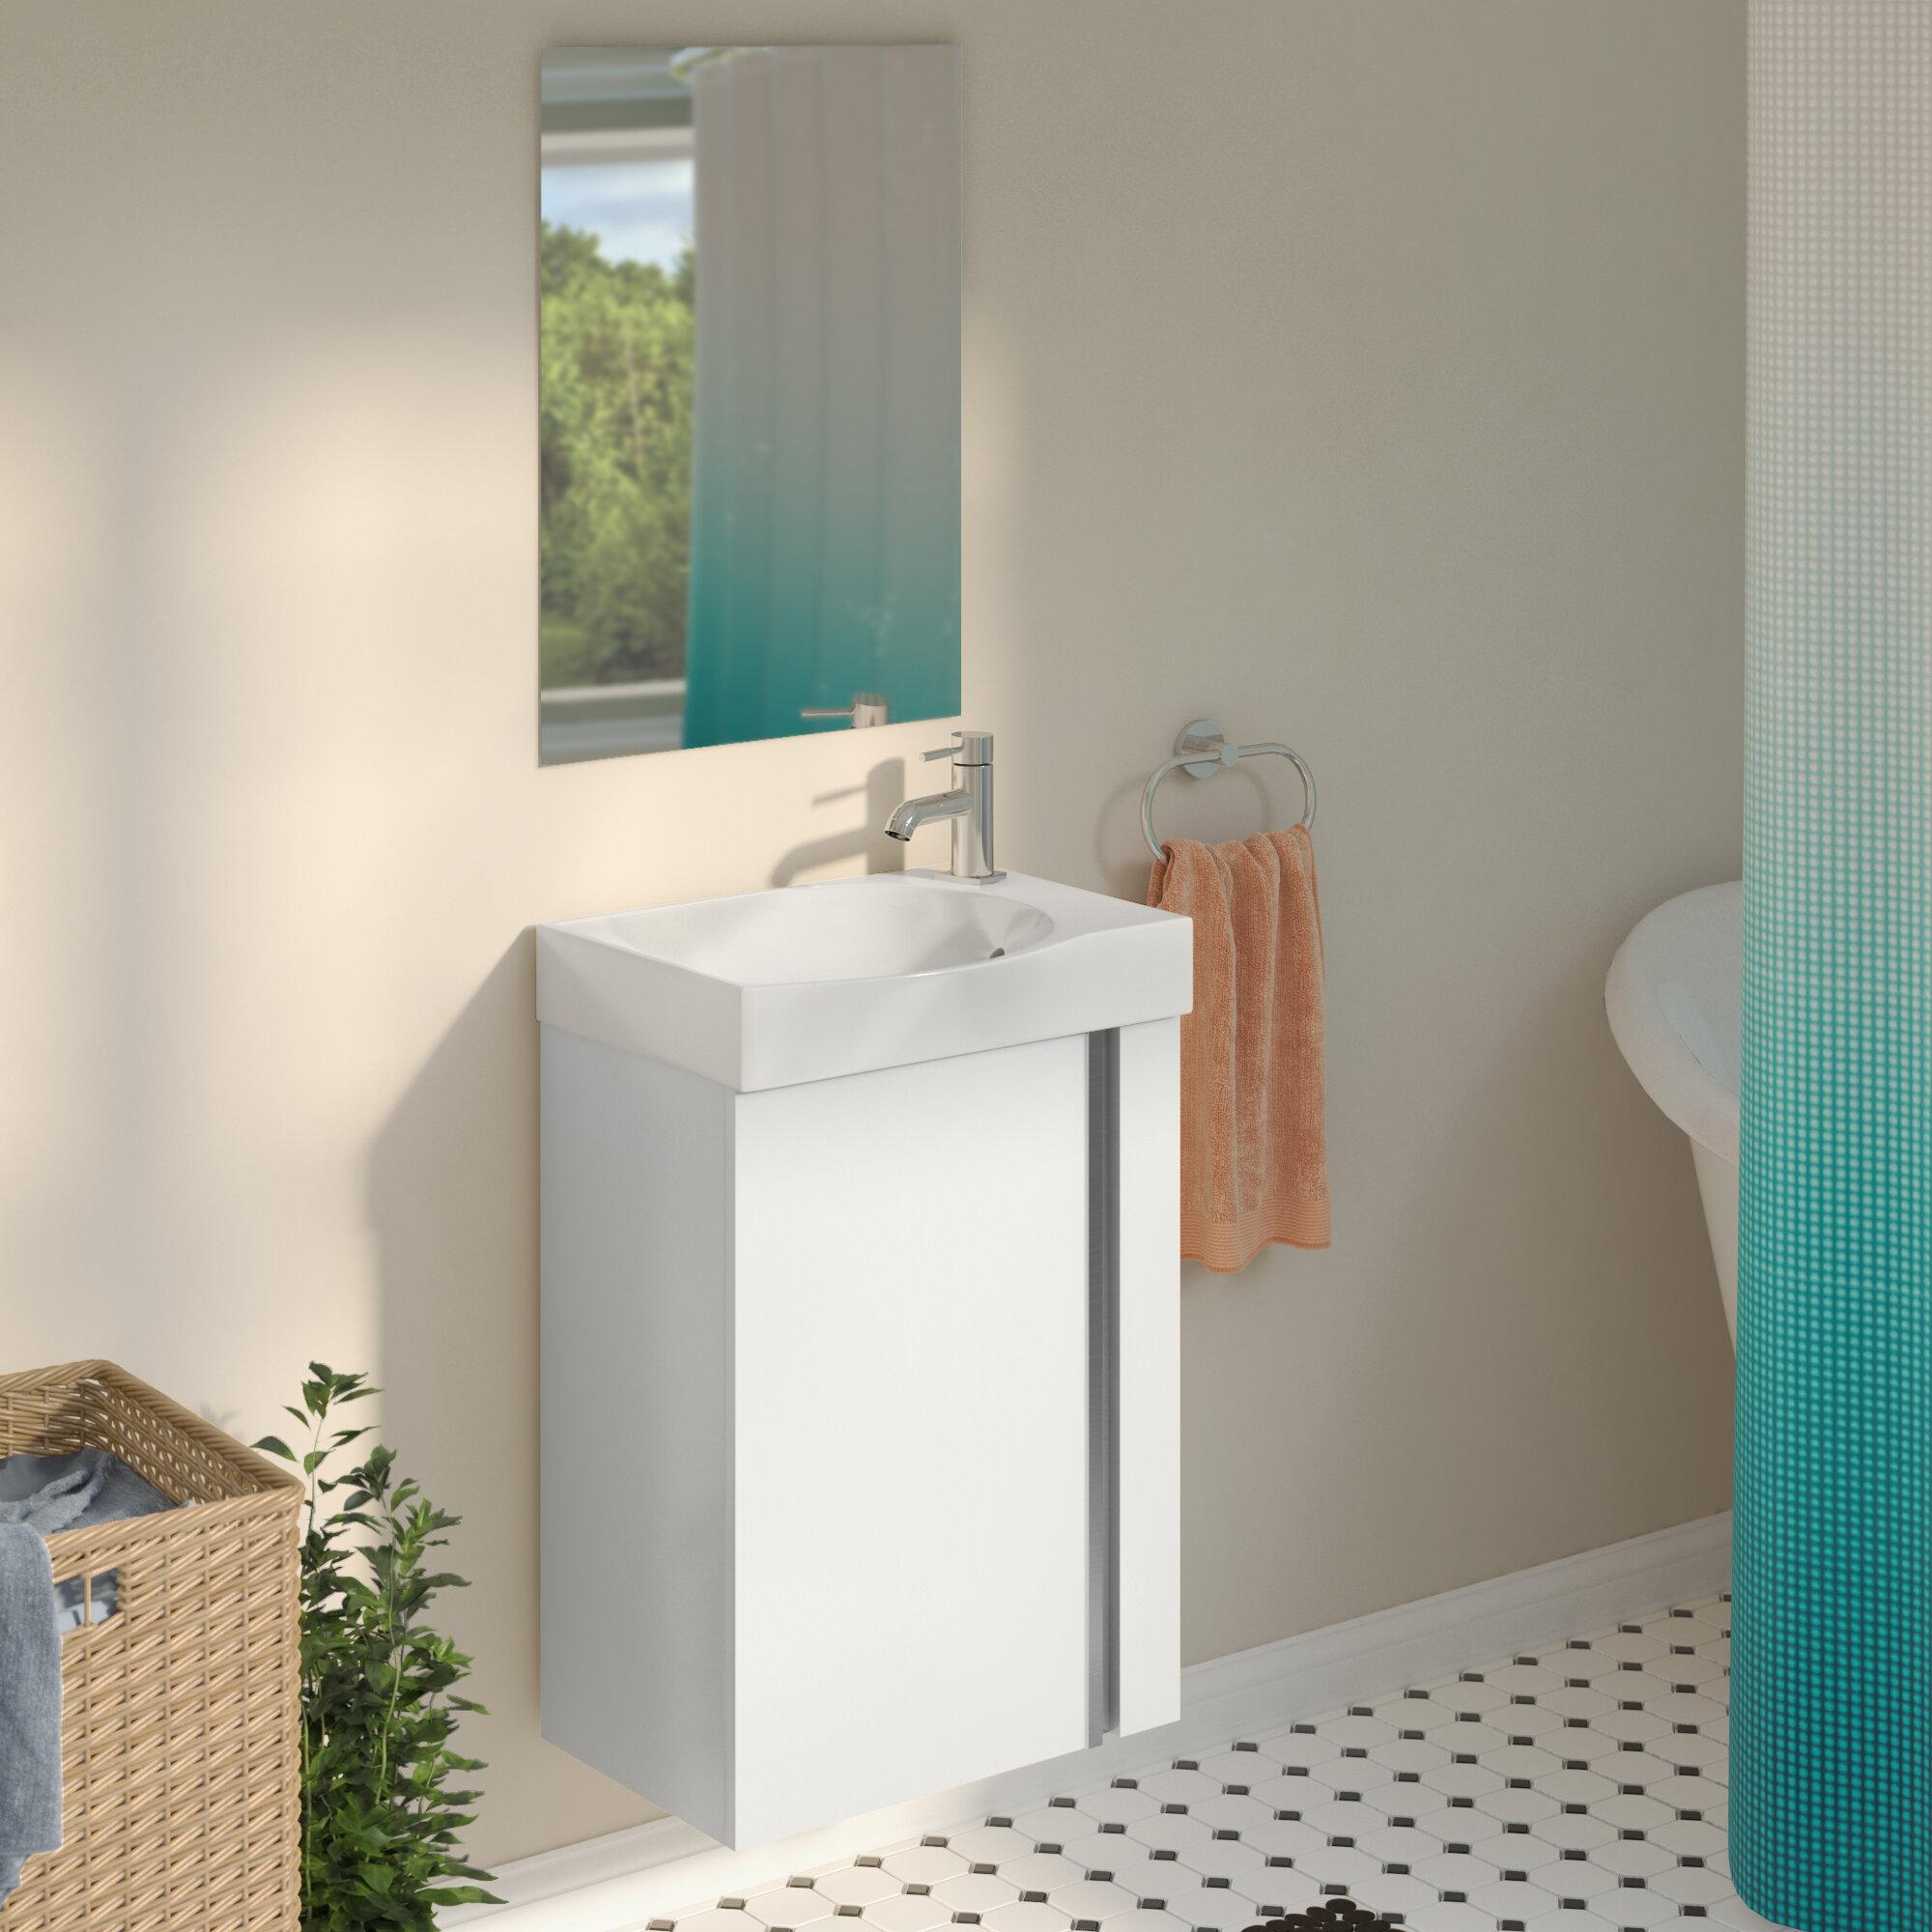 images set finish adams strasser bathroom single inch best of pinterest vanity on sink black ace depth unique in awesome